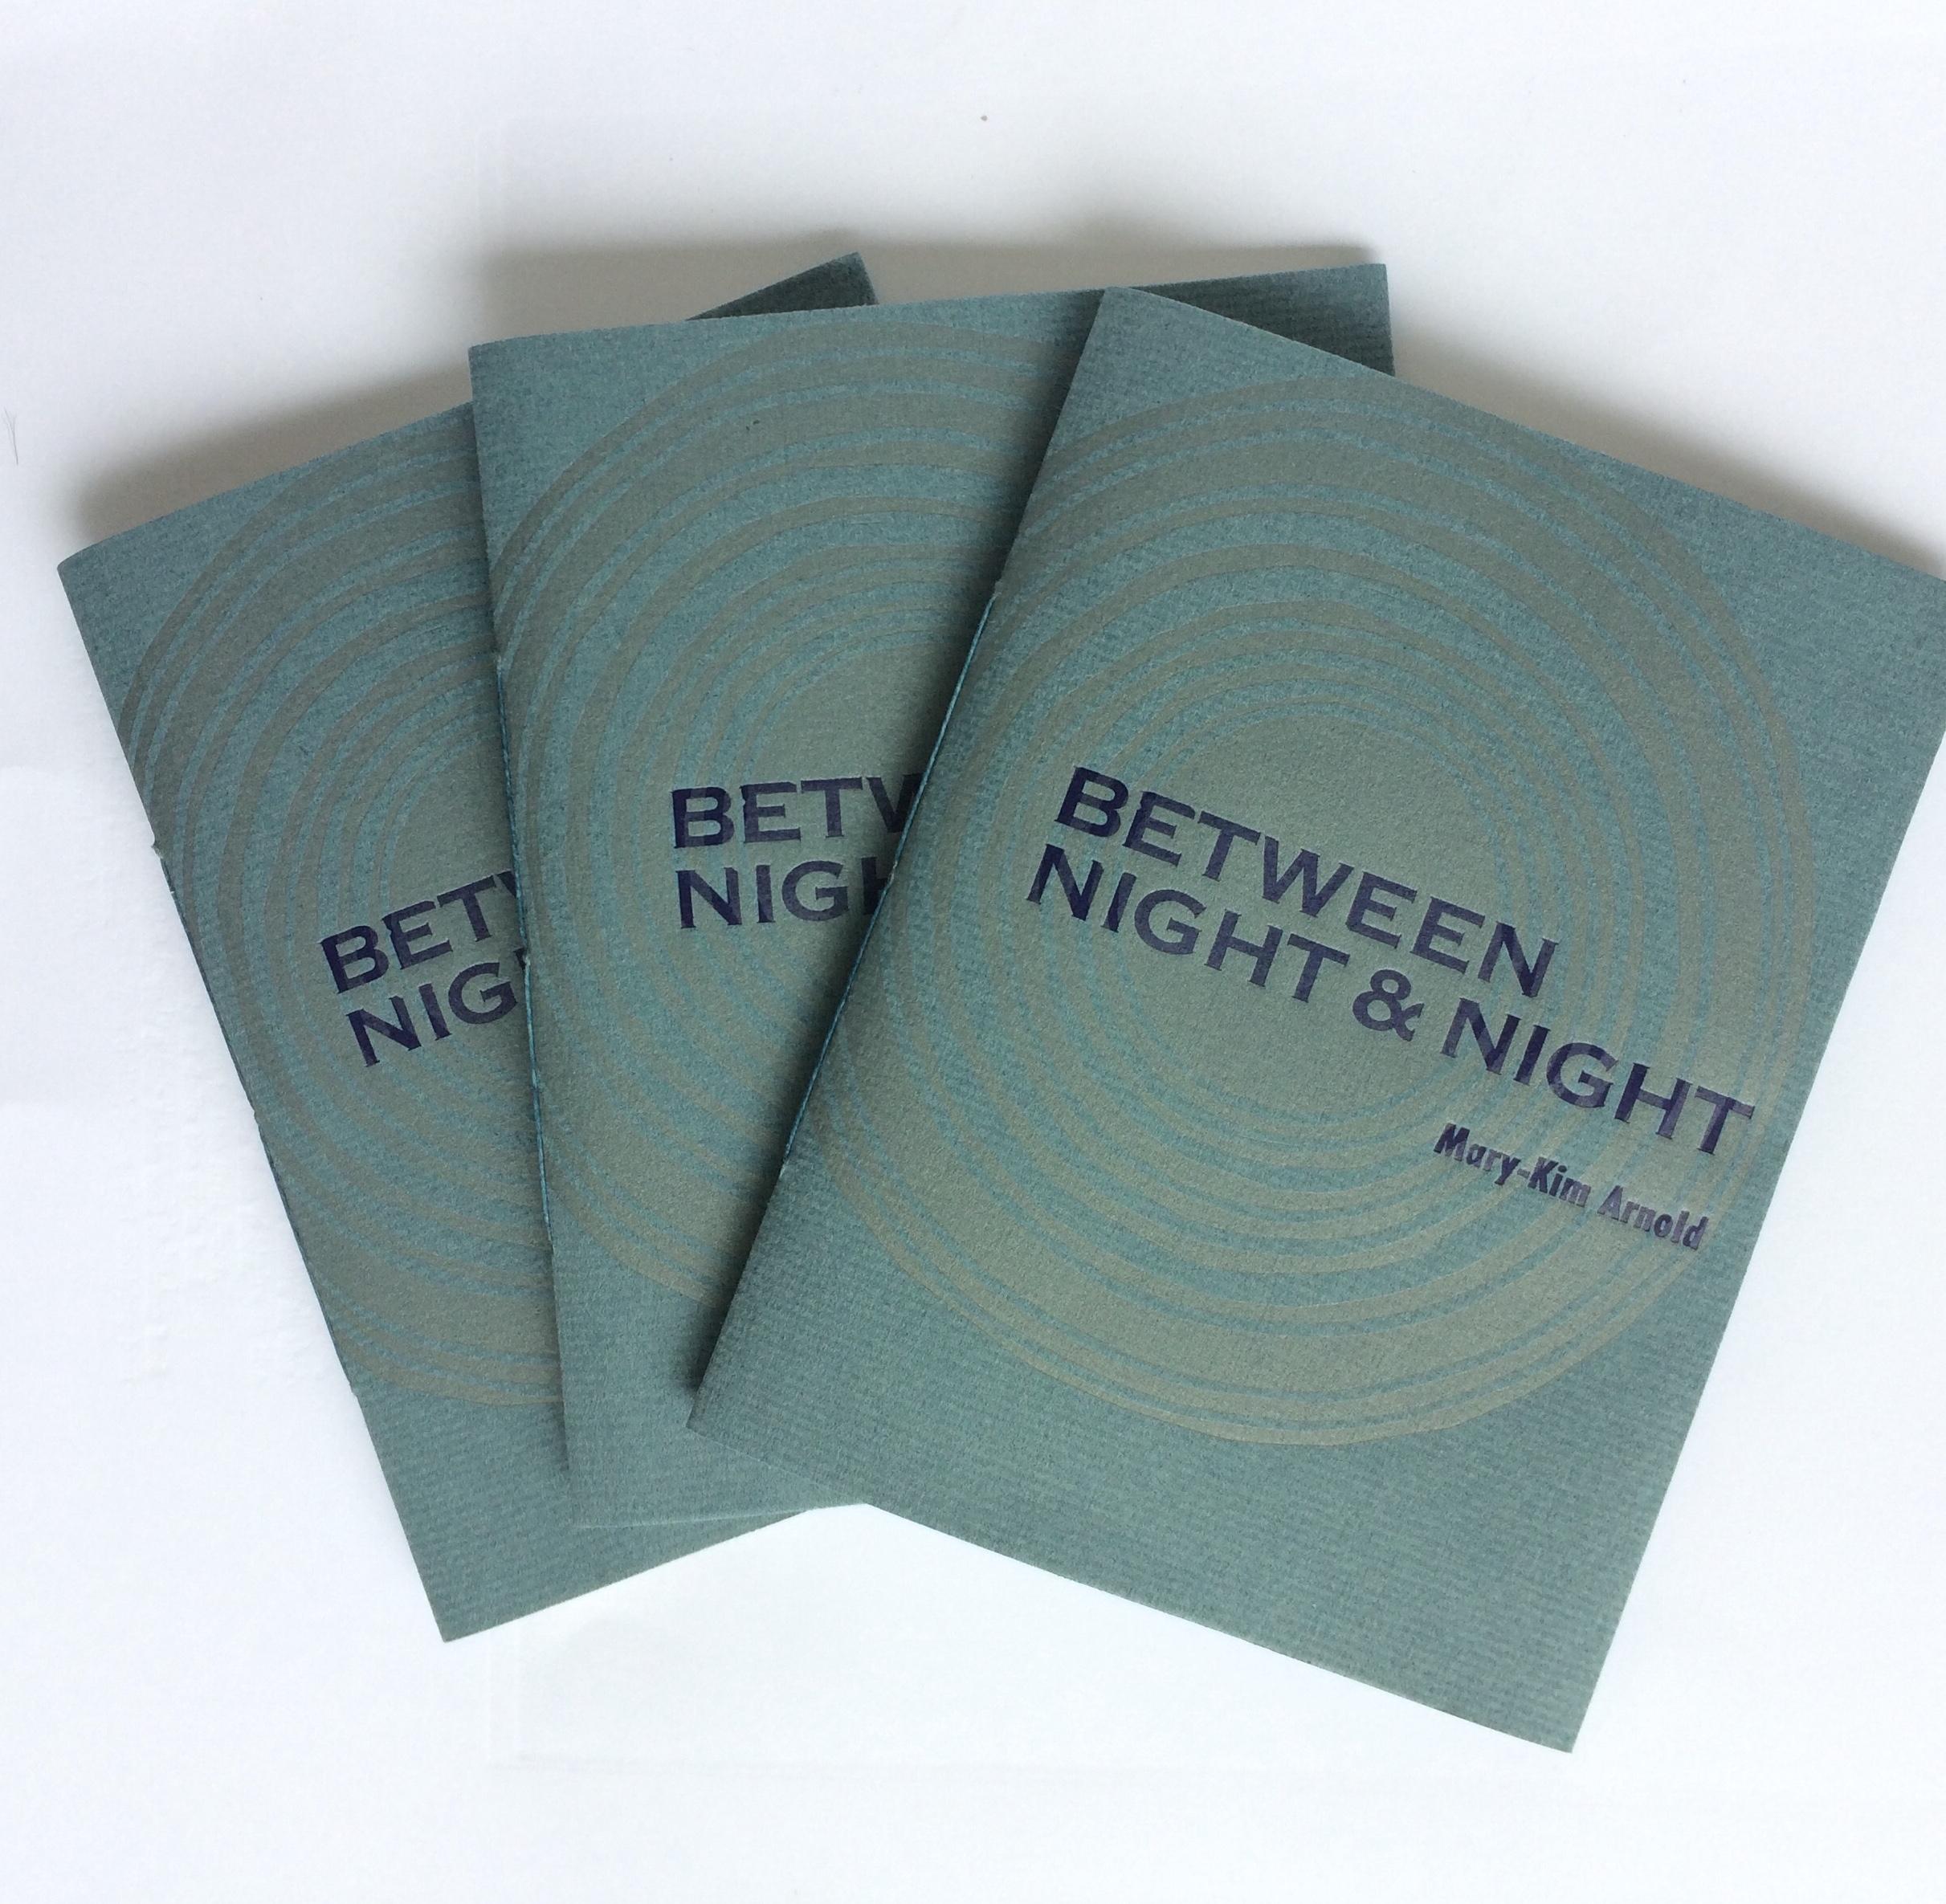 Between+Night+&+Night+3.jpg